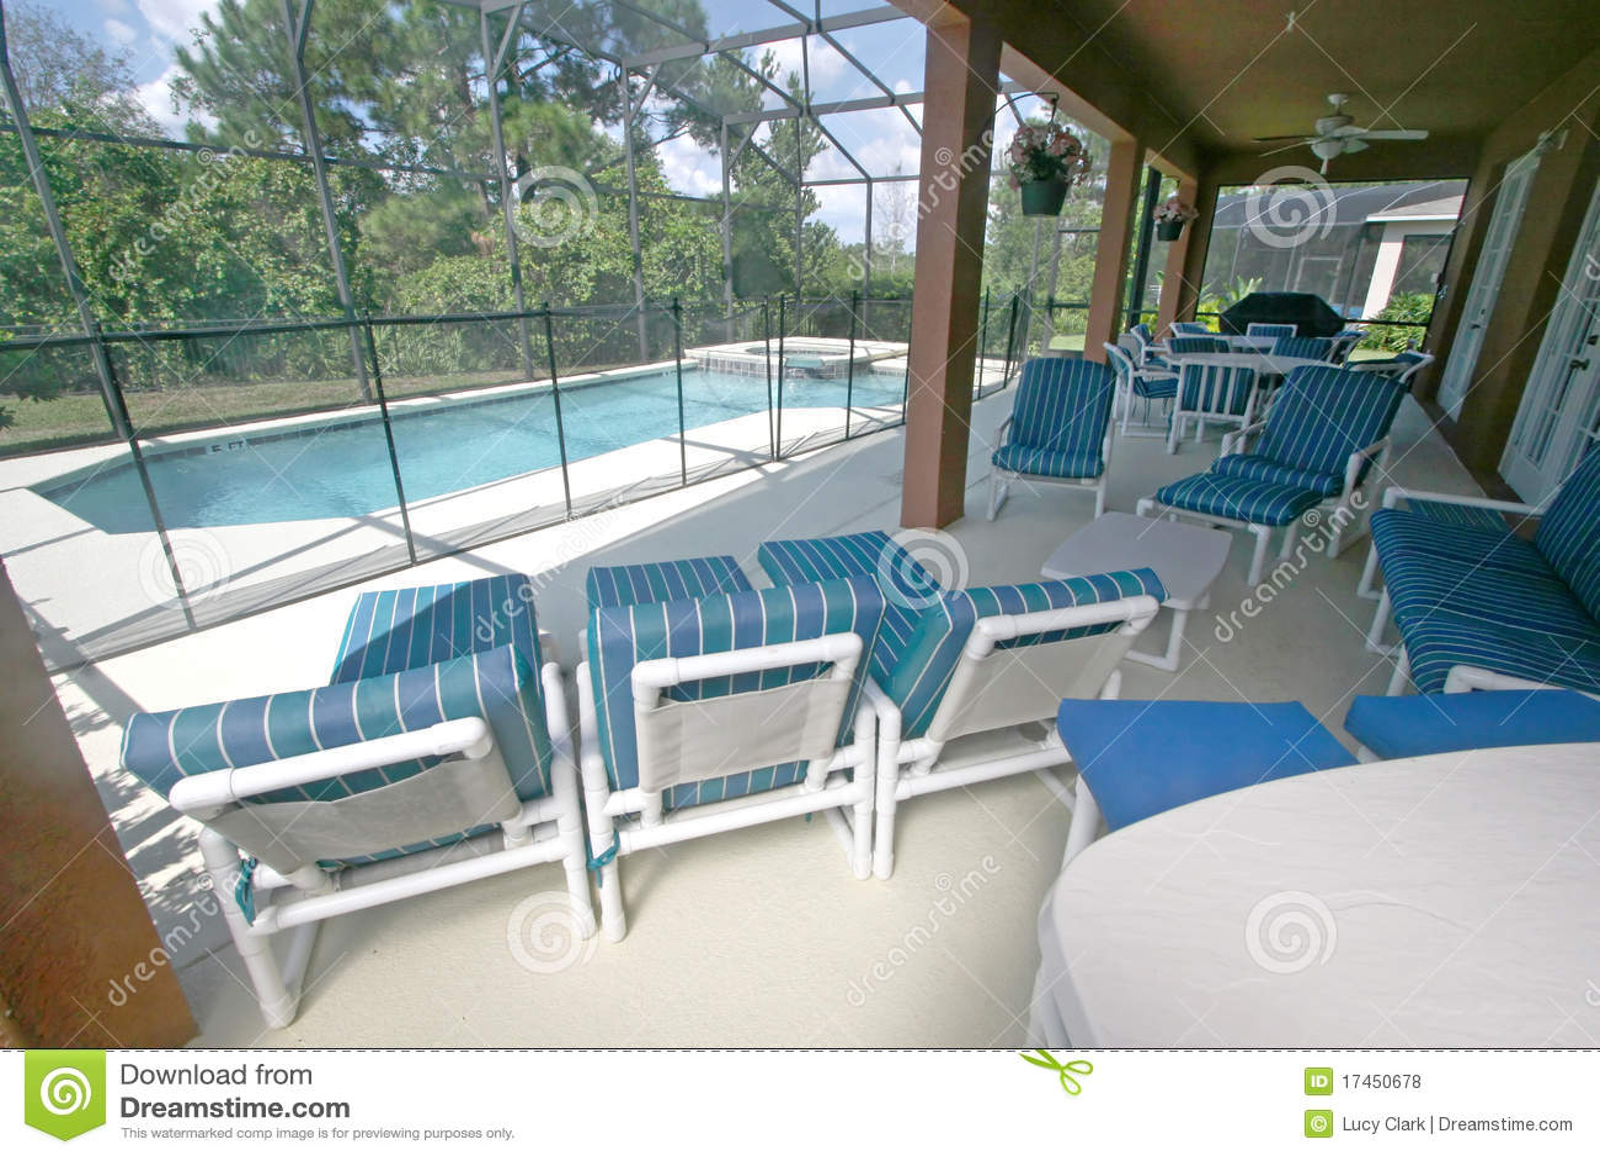 Lanai pool and spa royalty free stock photos image for Pool lanai cost